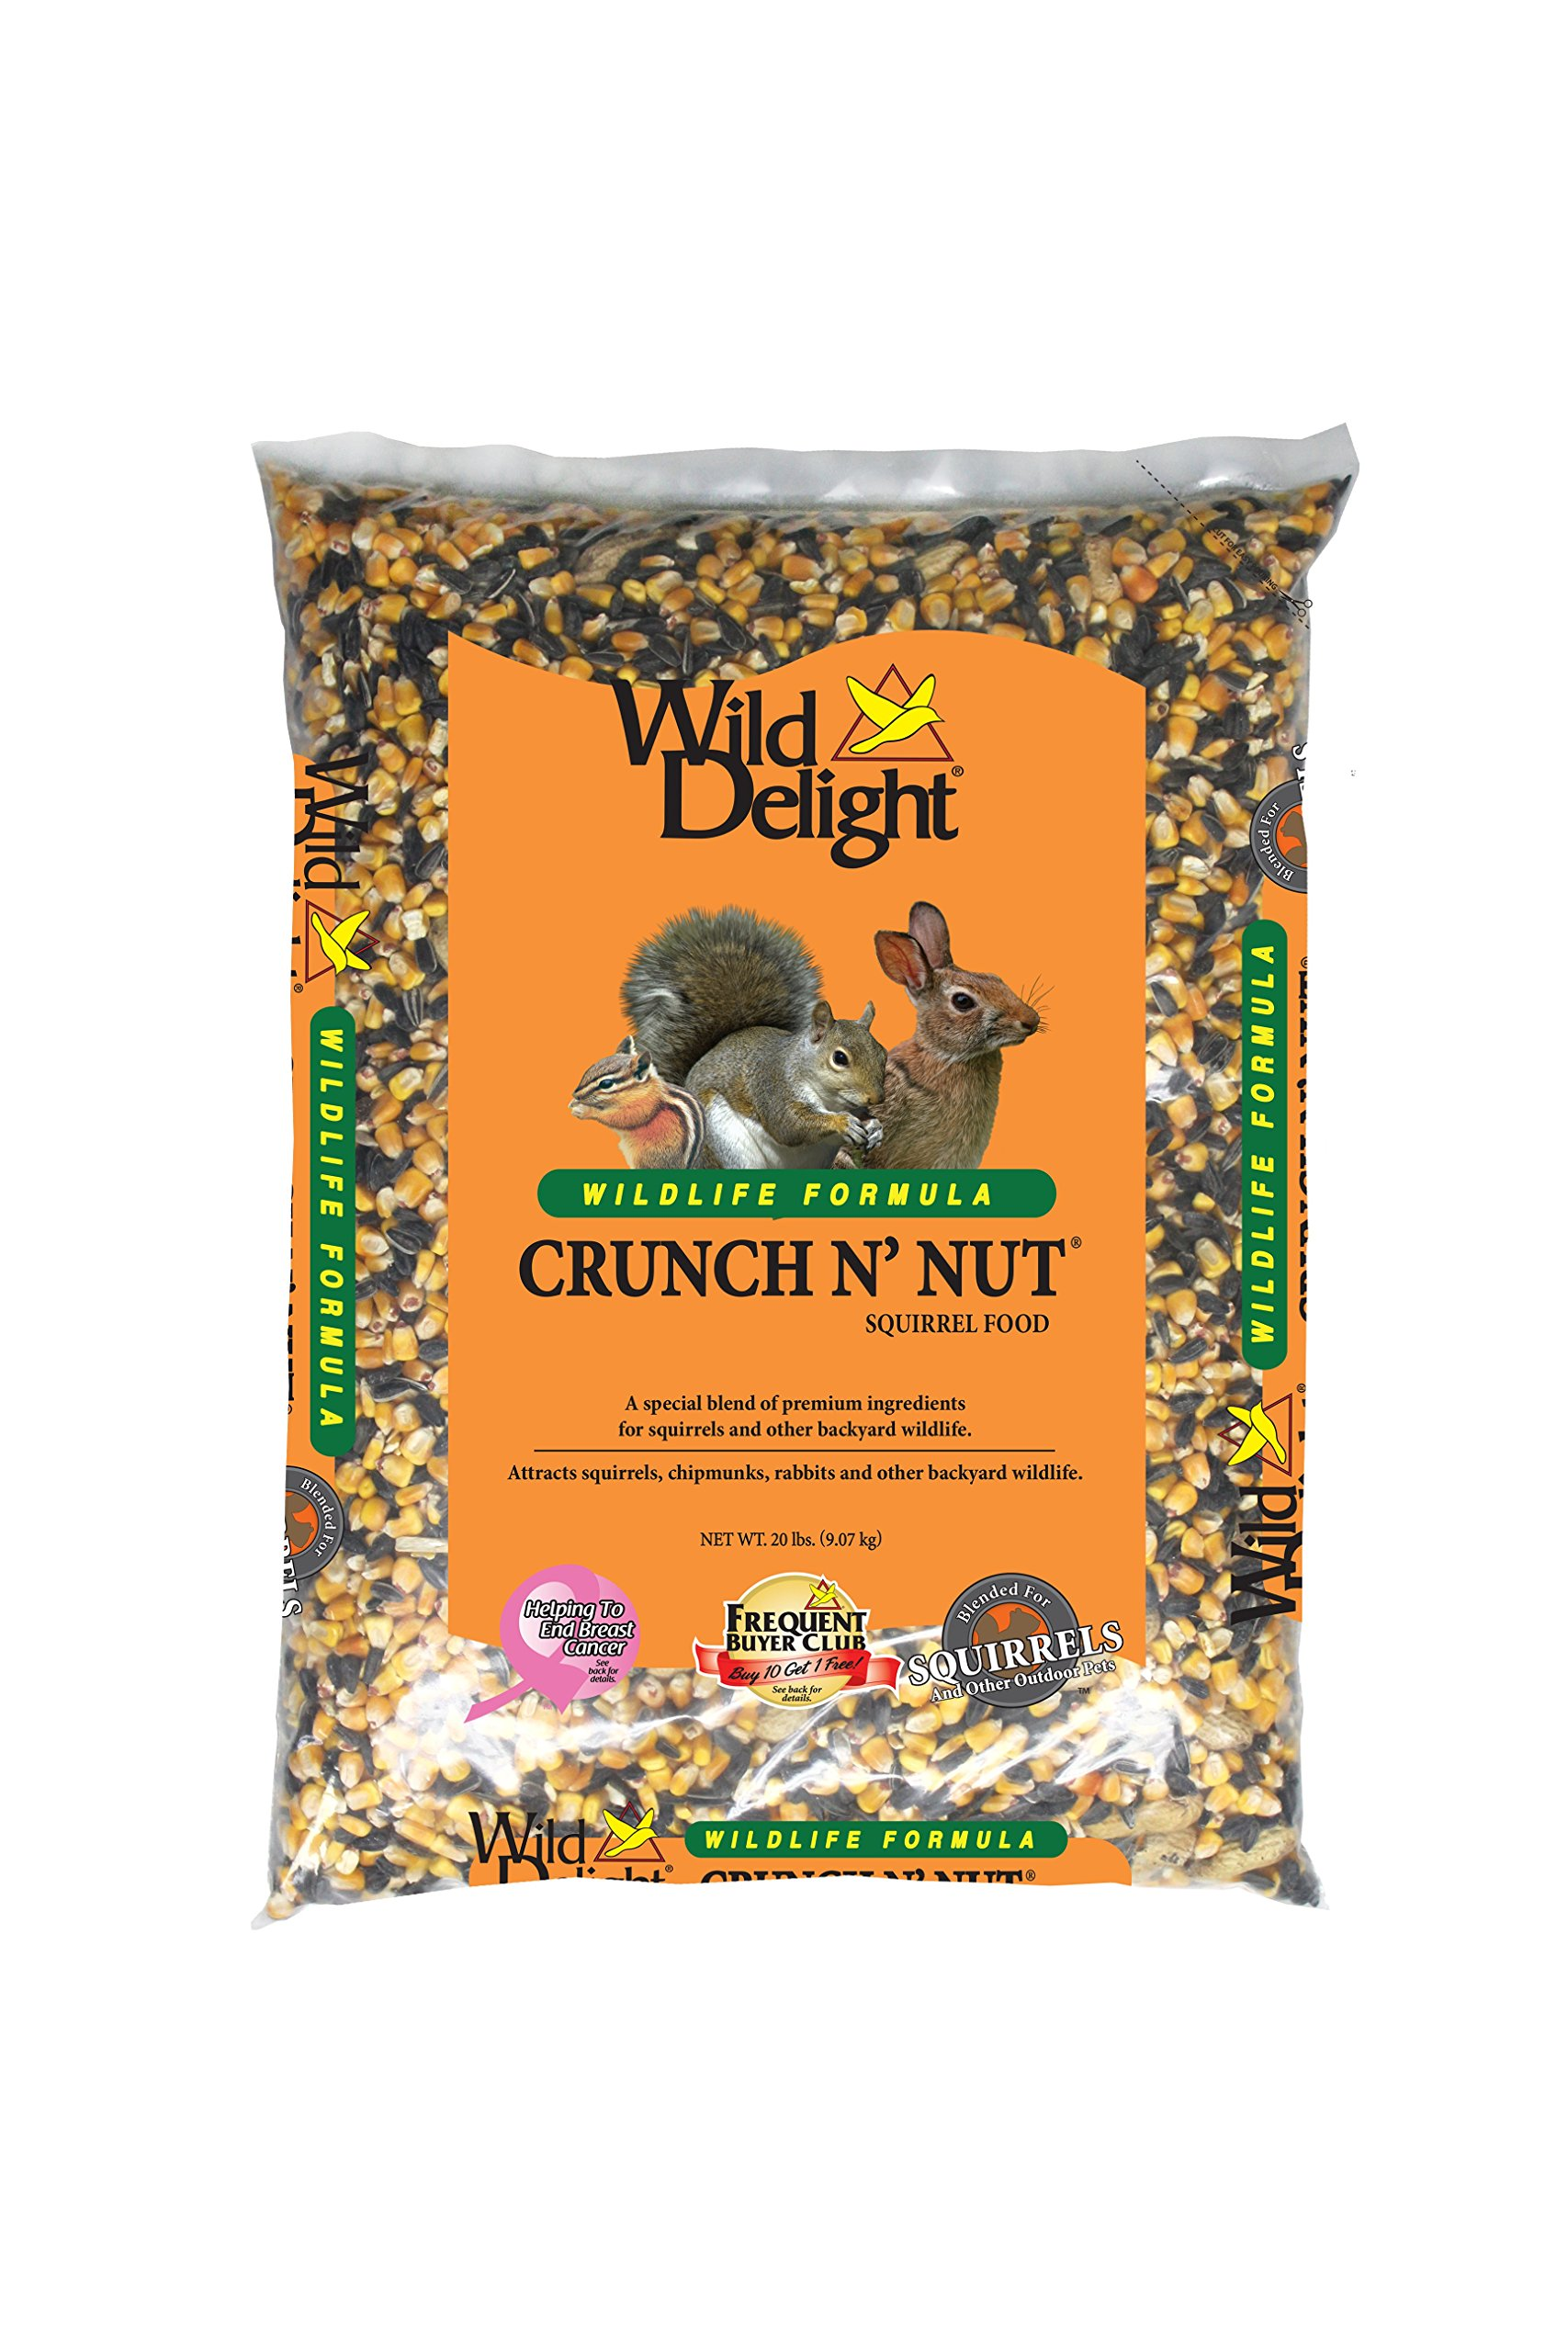 Wild Delight Crunch N' Nut Squirrel Food, 20 lb by Wild Delight